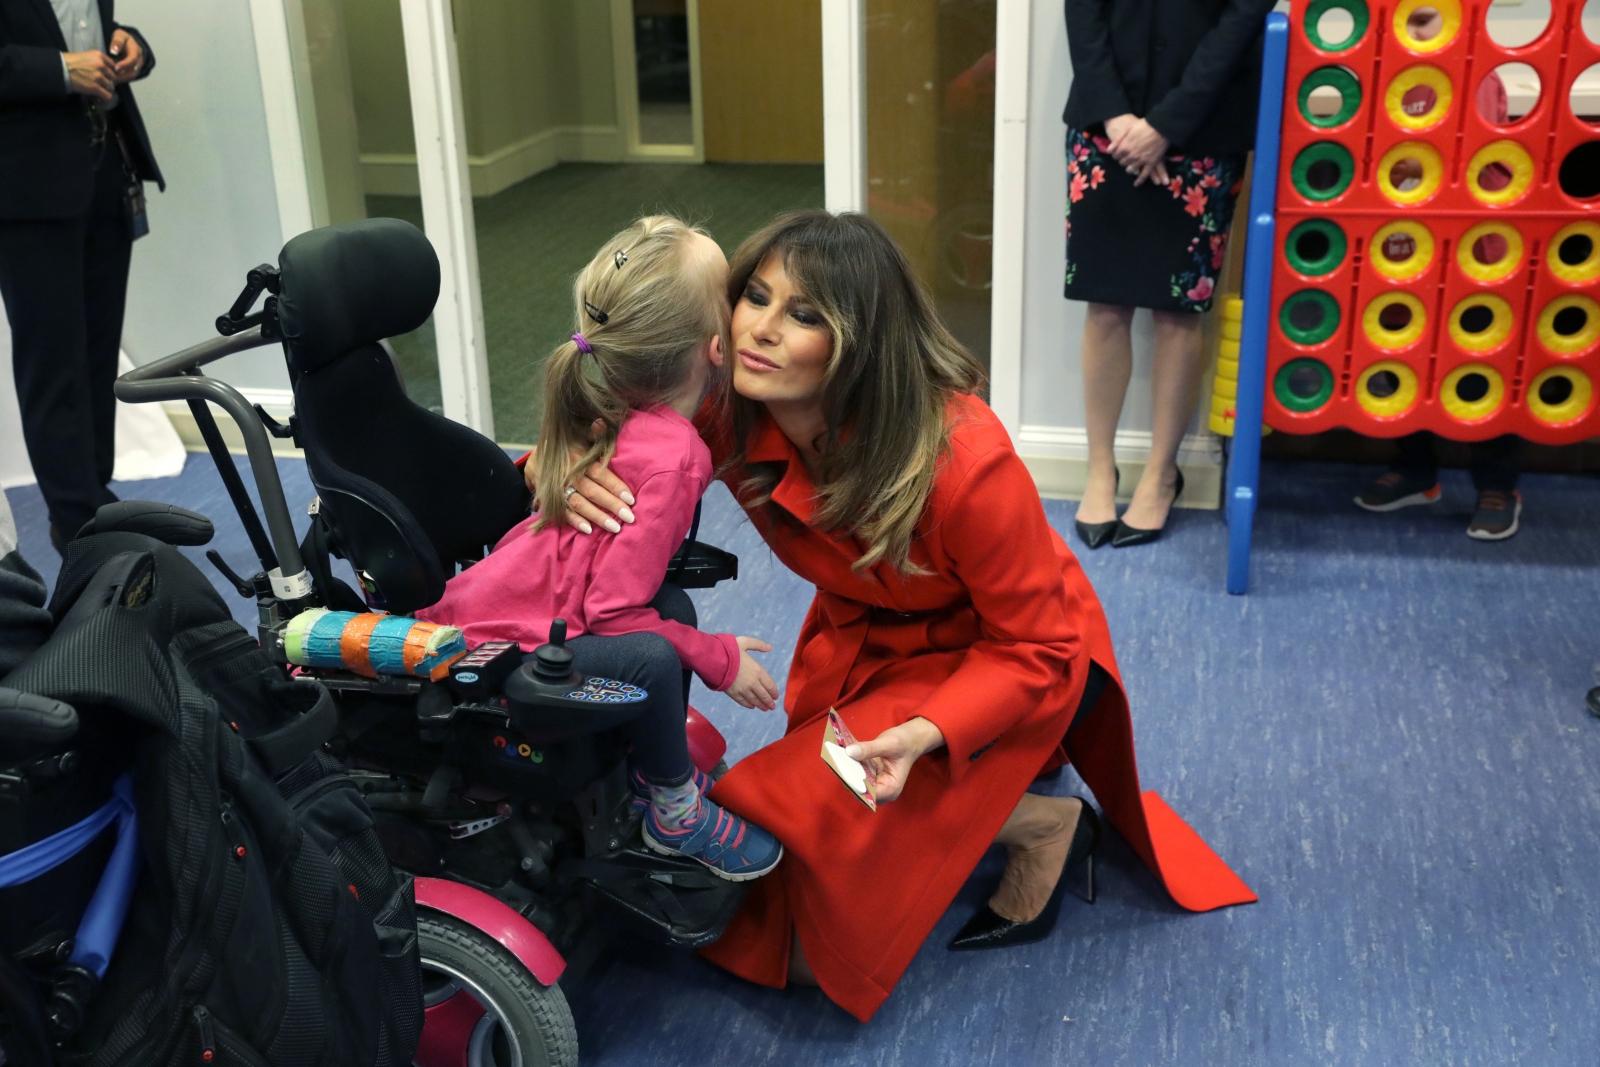 First Lady Melania Trump visited children at The Children's Inn